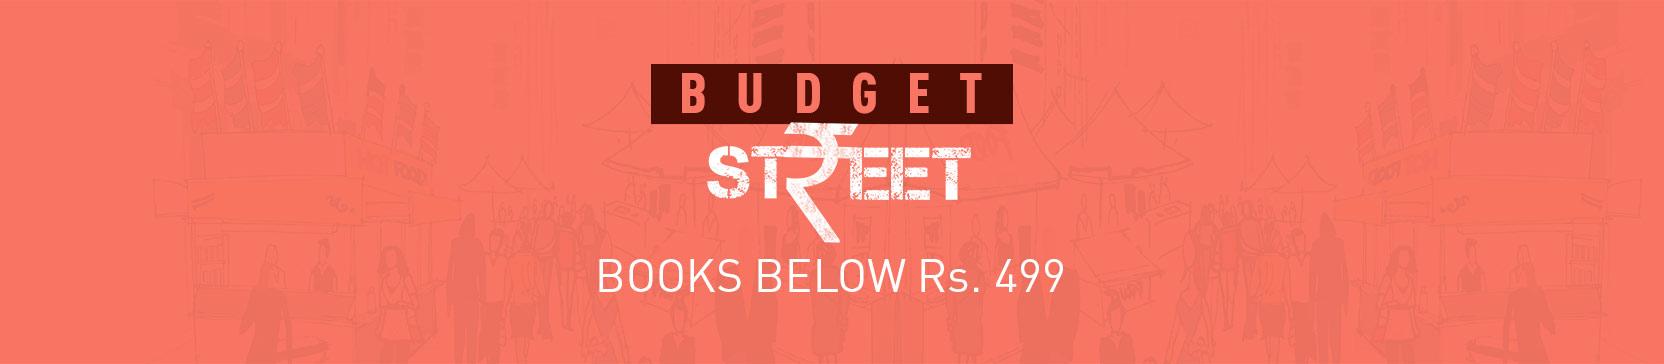 Budgetstreet_02Dec2015x99.jpg